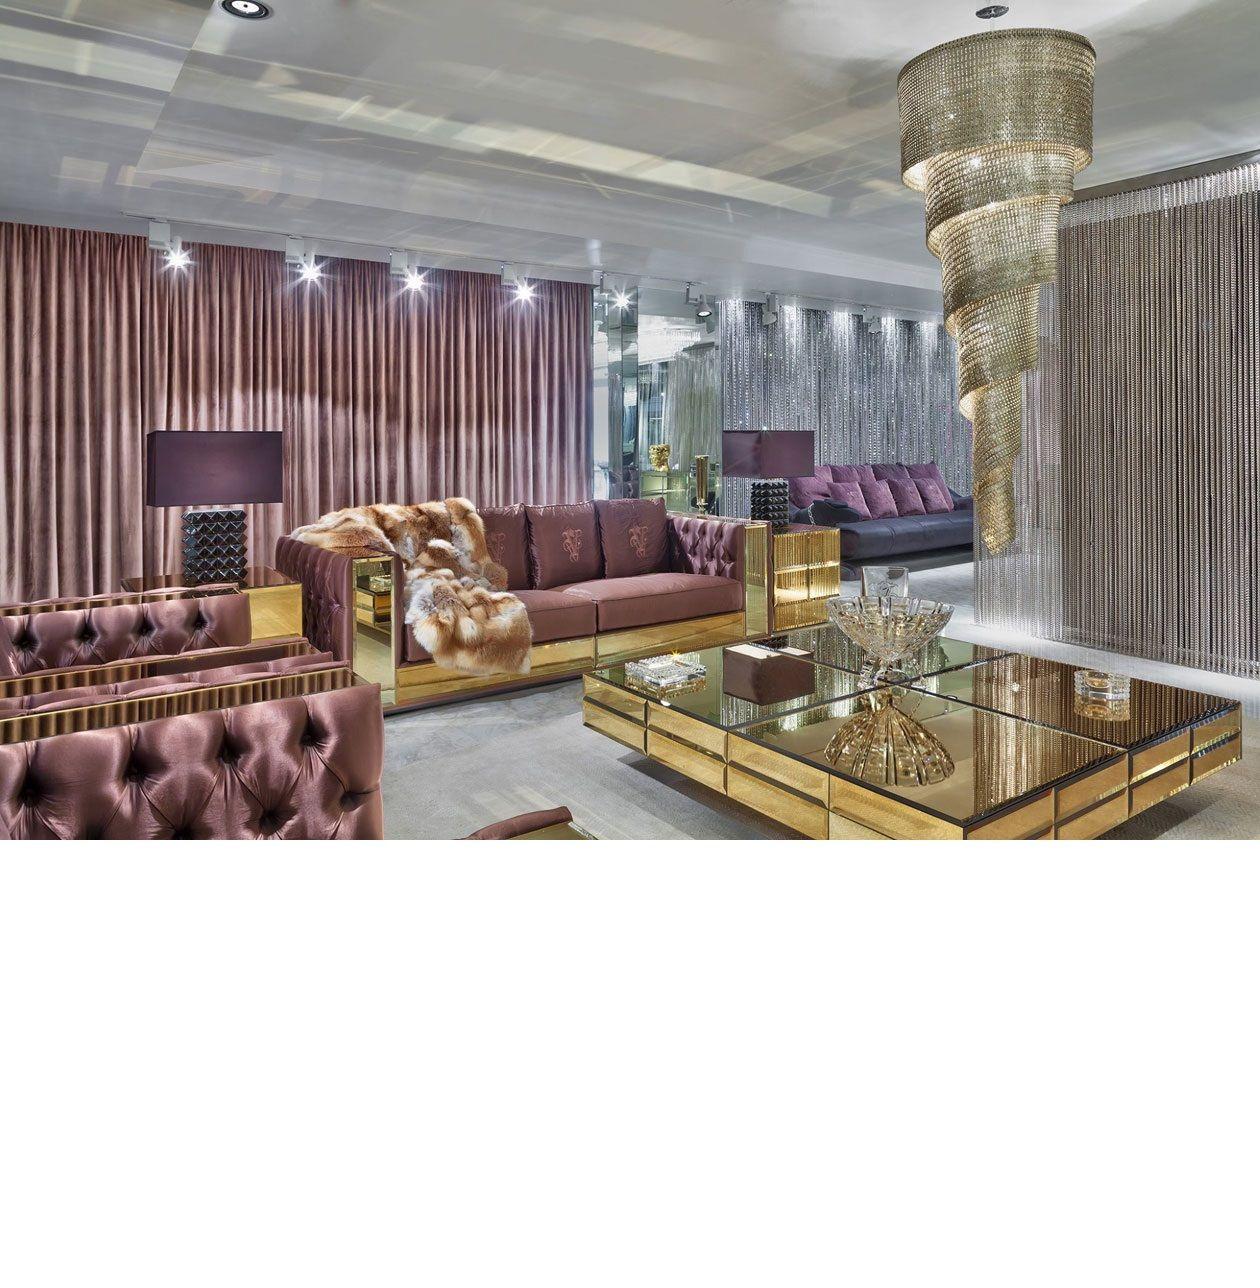 Home Decor 2012 Luxury Homes Interior Decoration Living: Luxury Lighting, Luxury Furniture, Luxury Home Decor